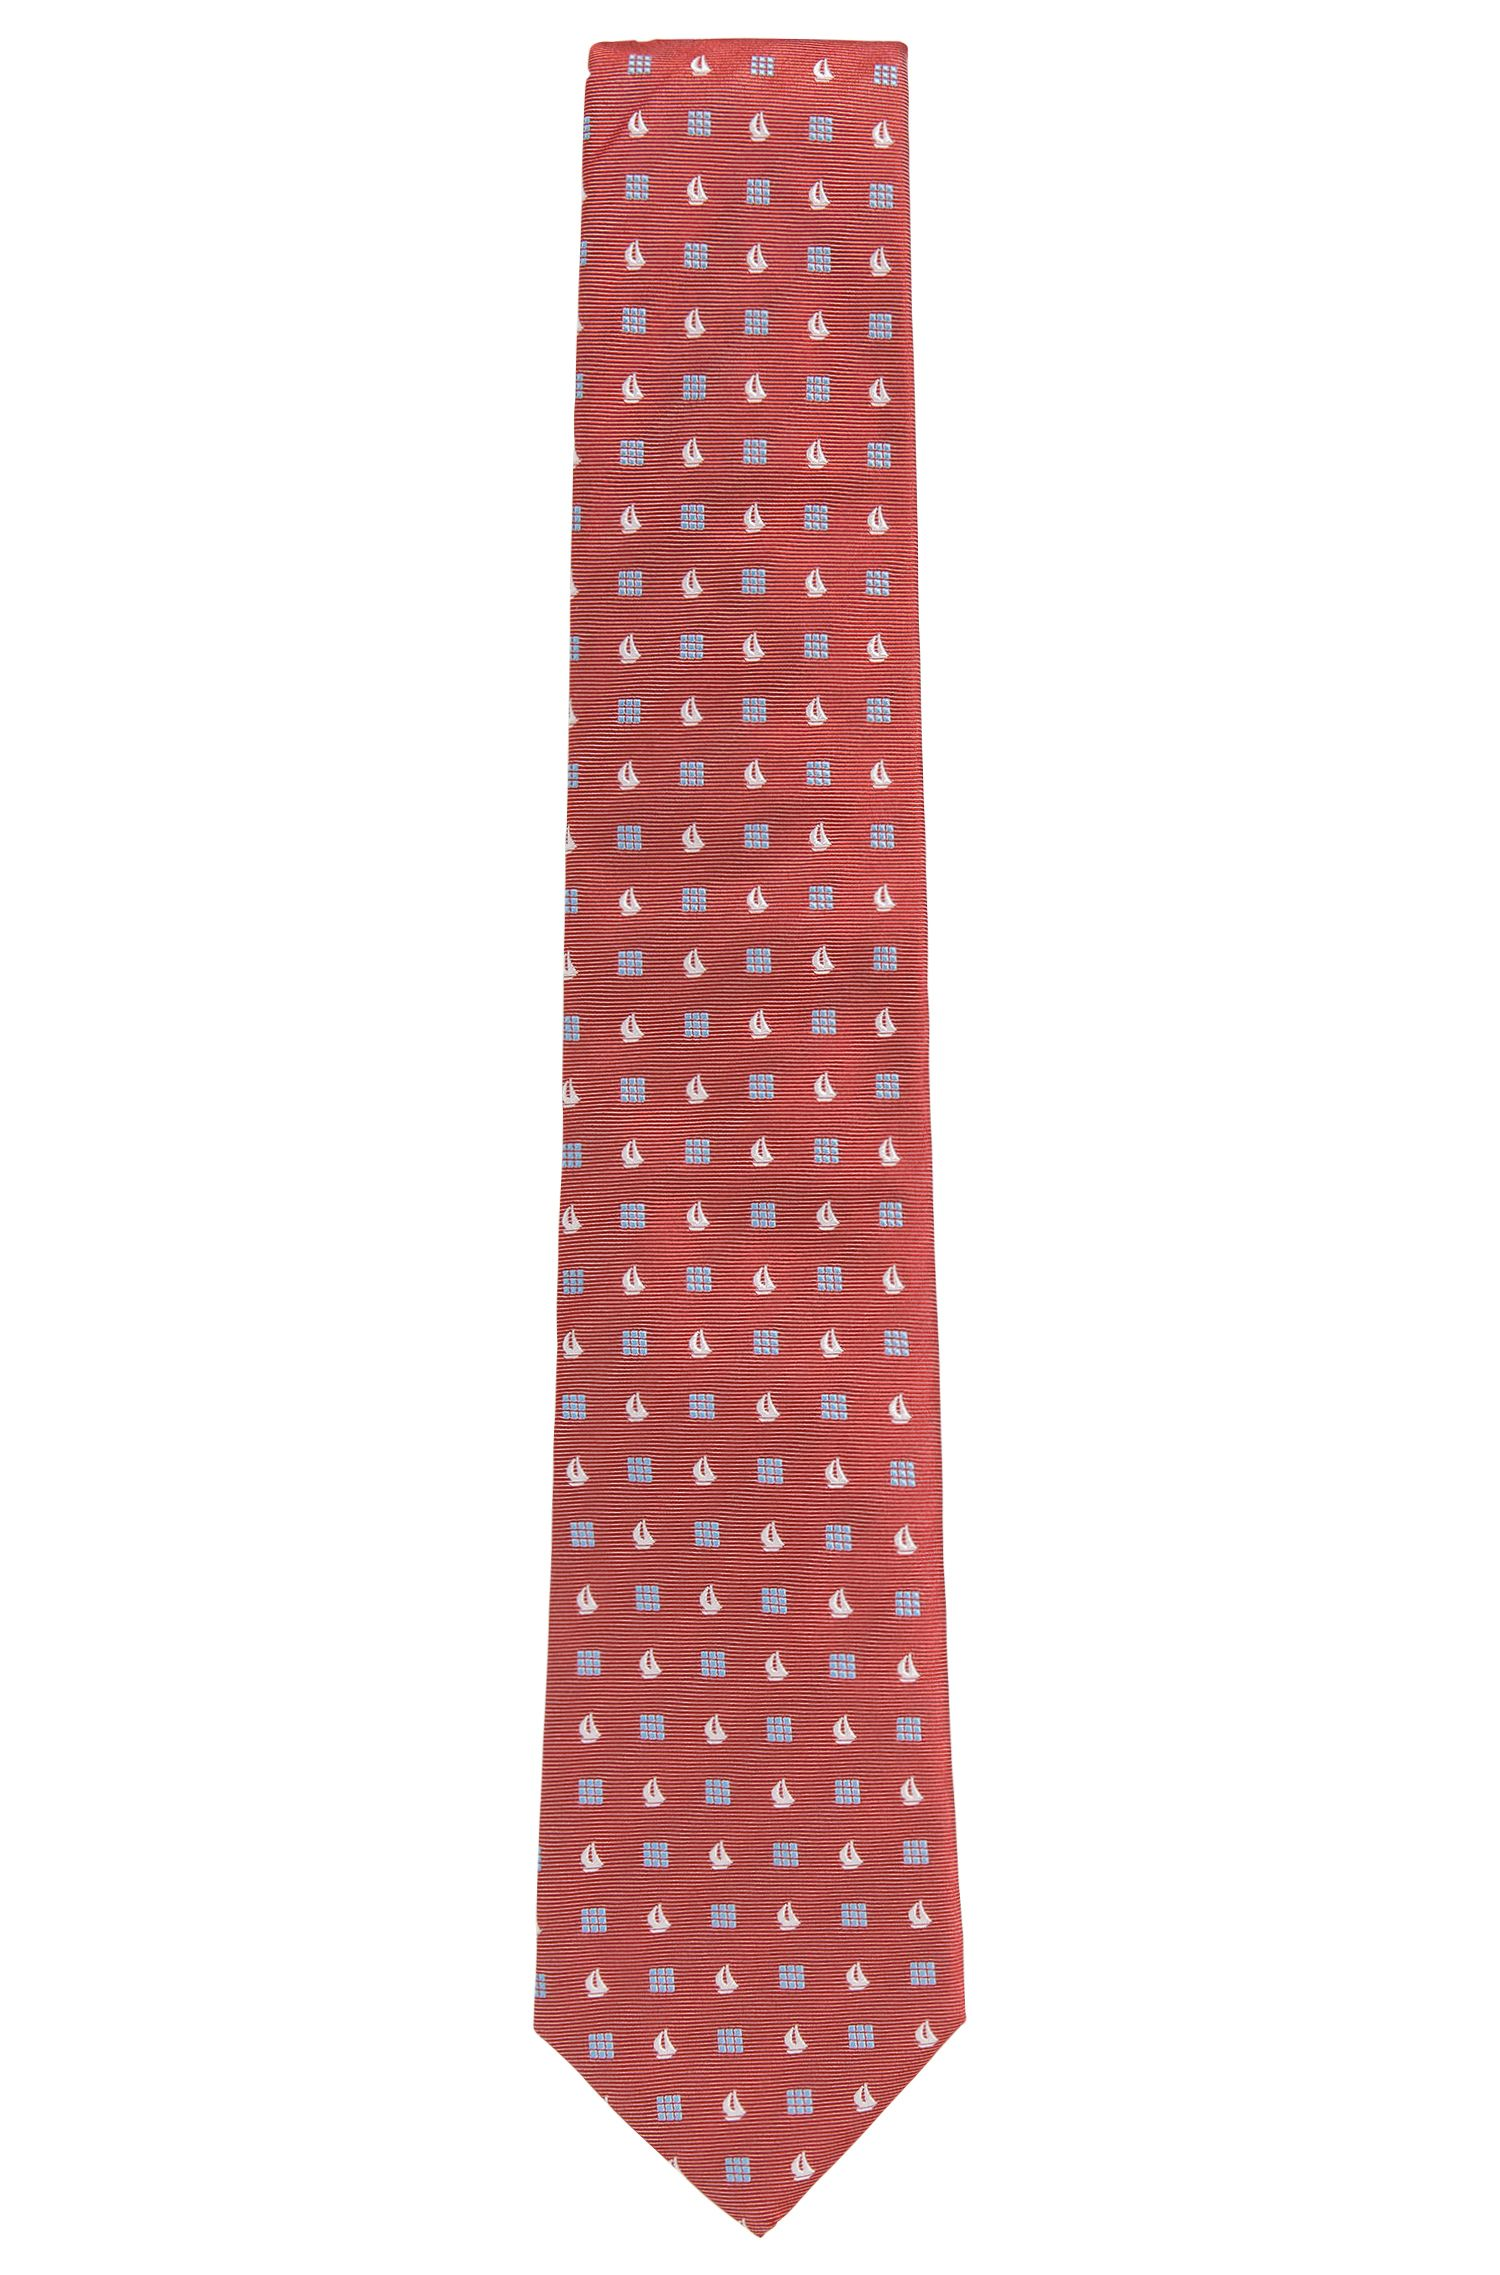 Sailboat Embroidered Italian Silk Tie , Dark pink